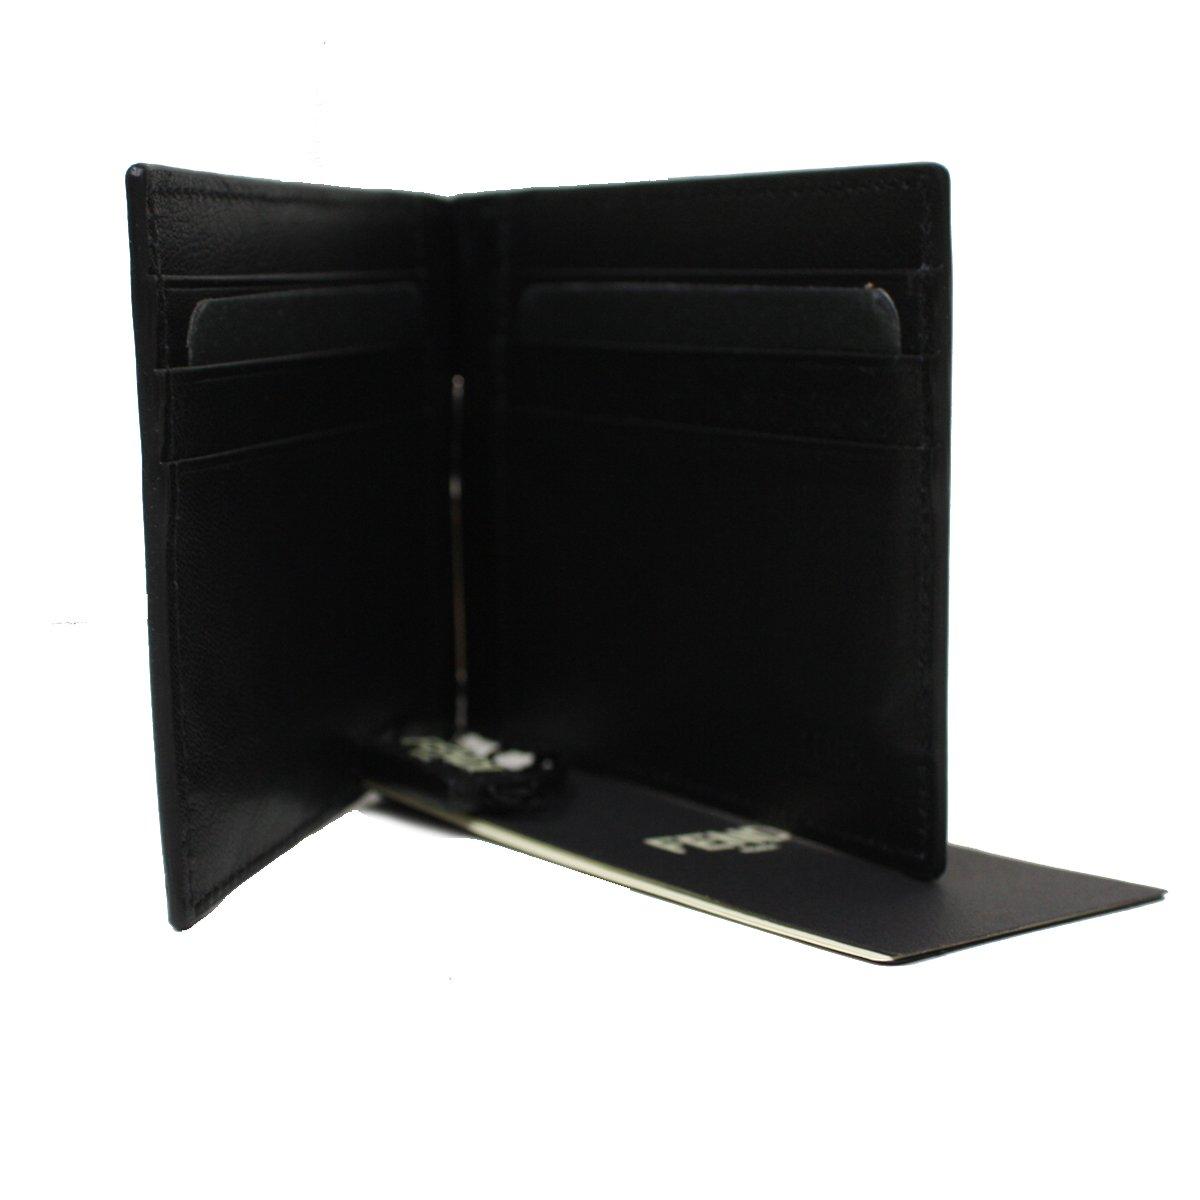 6ffa227999 FENDI Card Case 'Crayons' Saffian Leather Men's Bi-fold Wallet ...